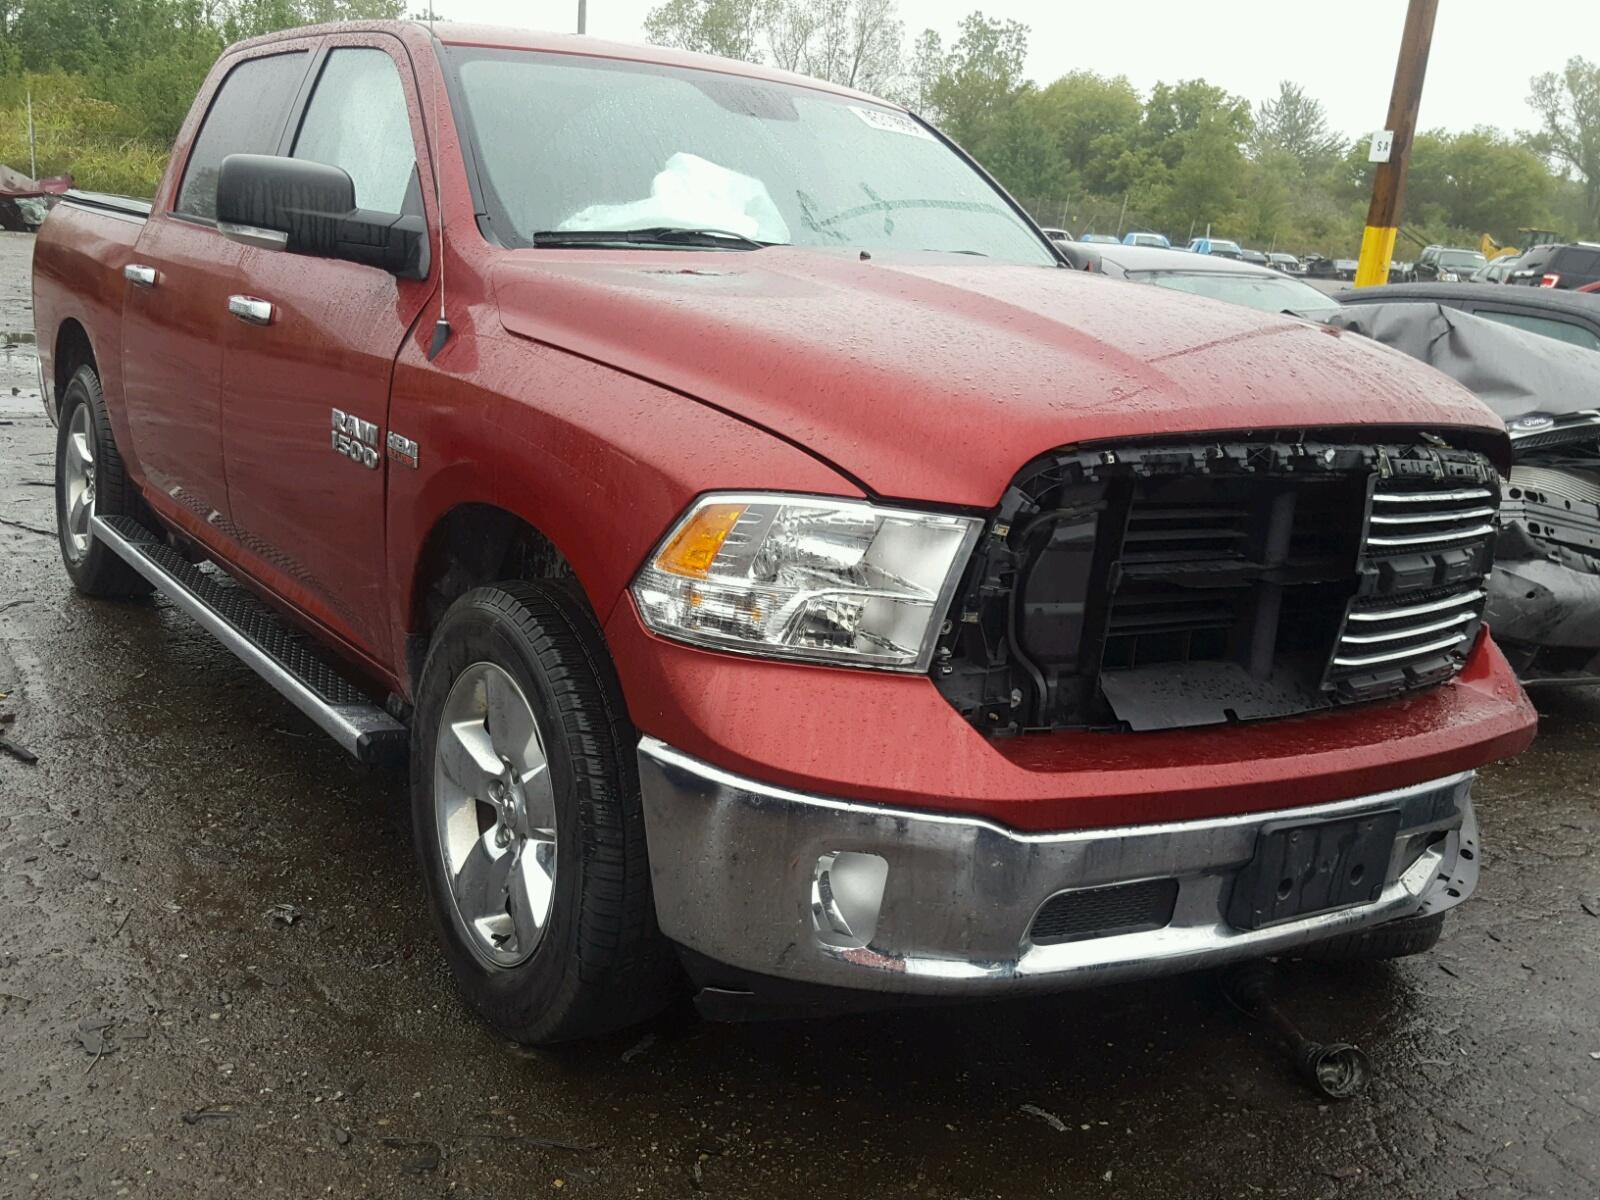 Salvage 2014 Dodge RAM for sale